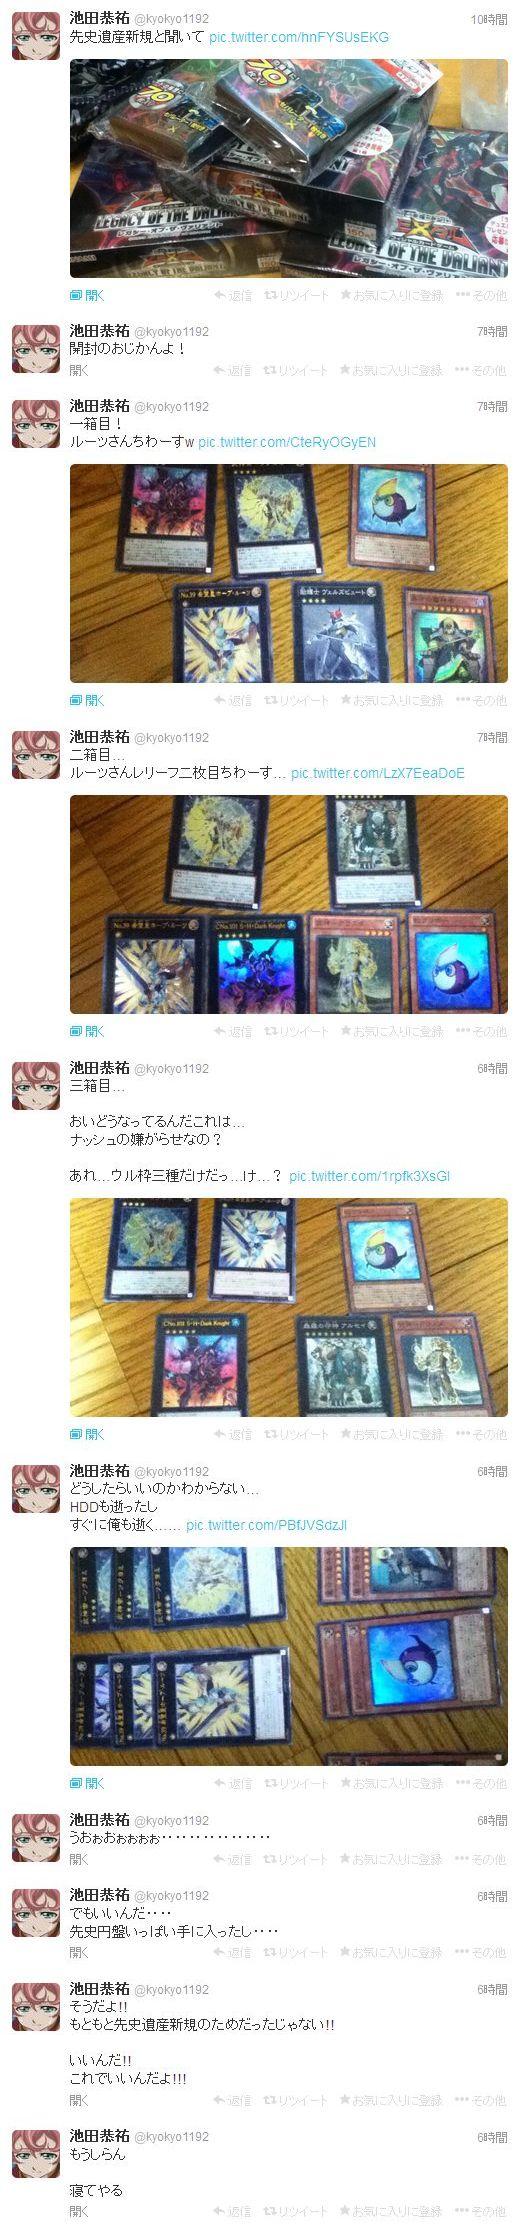 ikeda_no_higeki.jpg